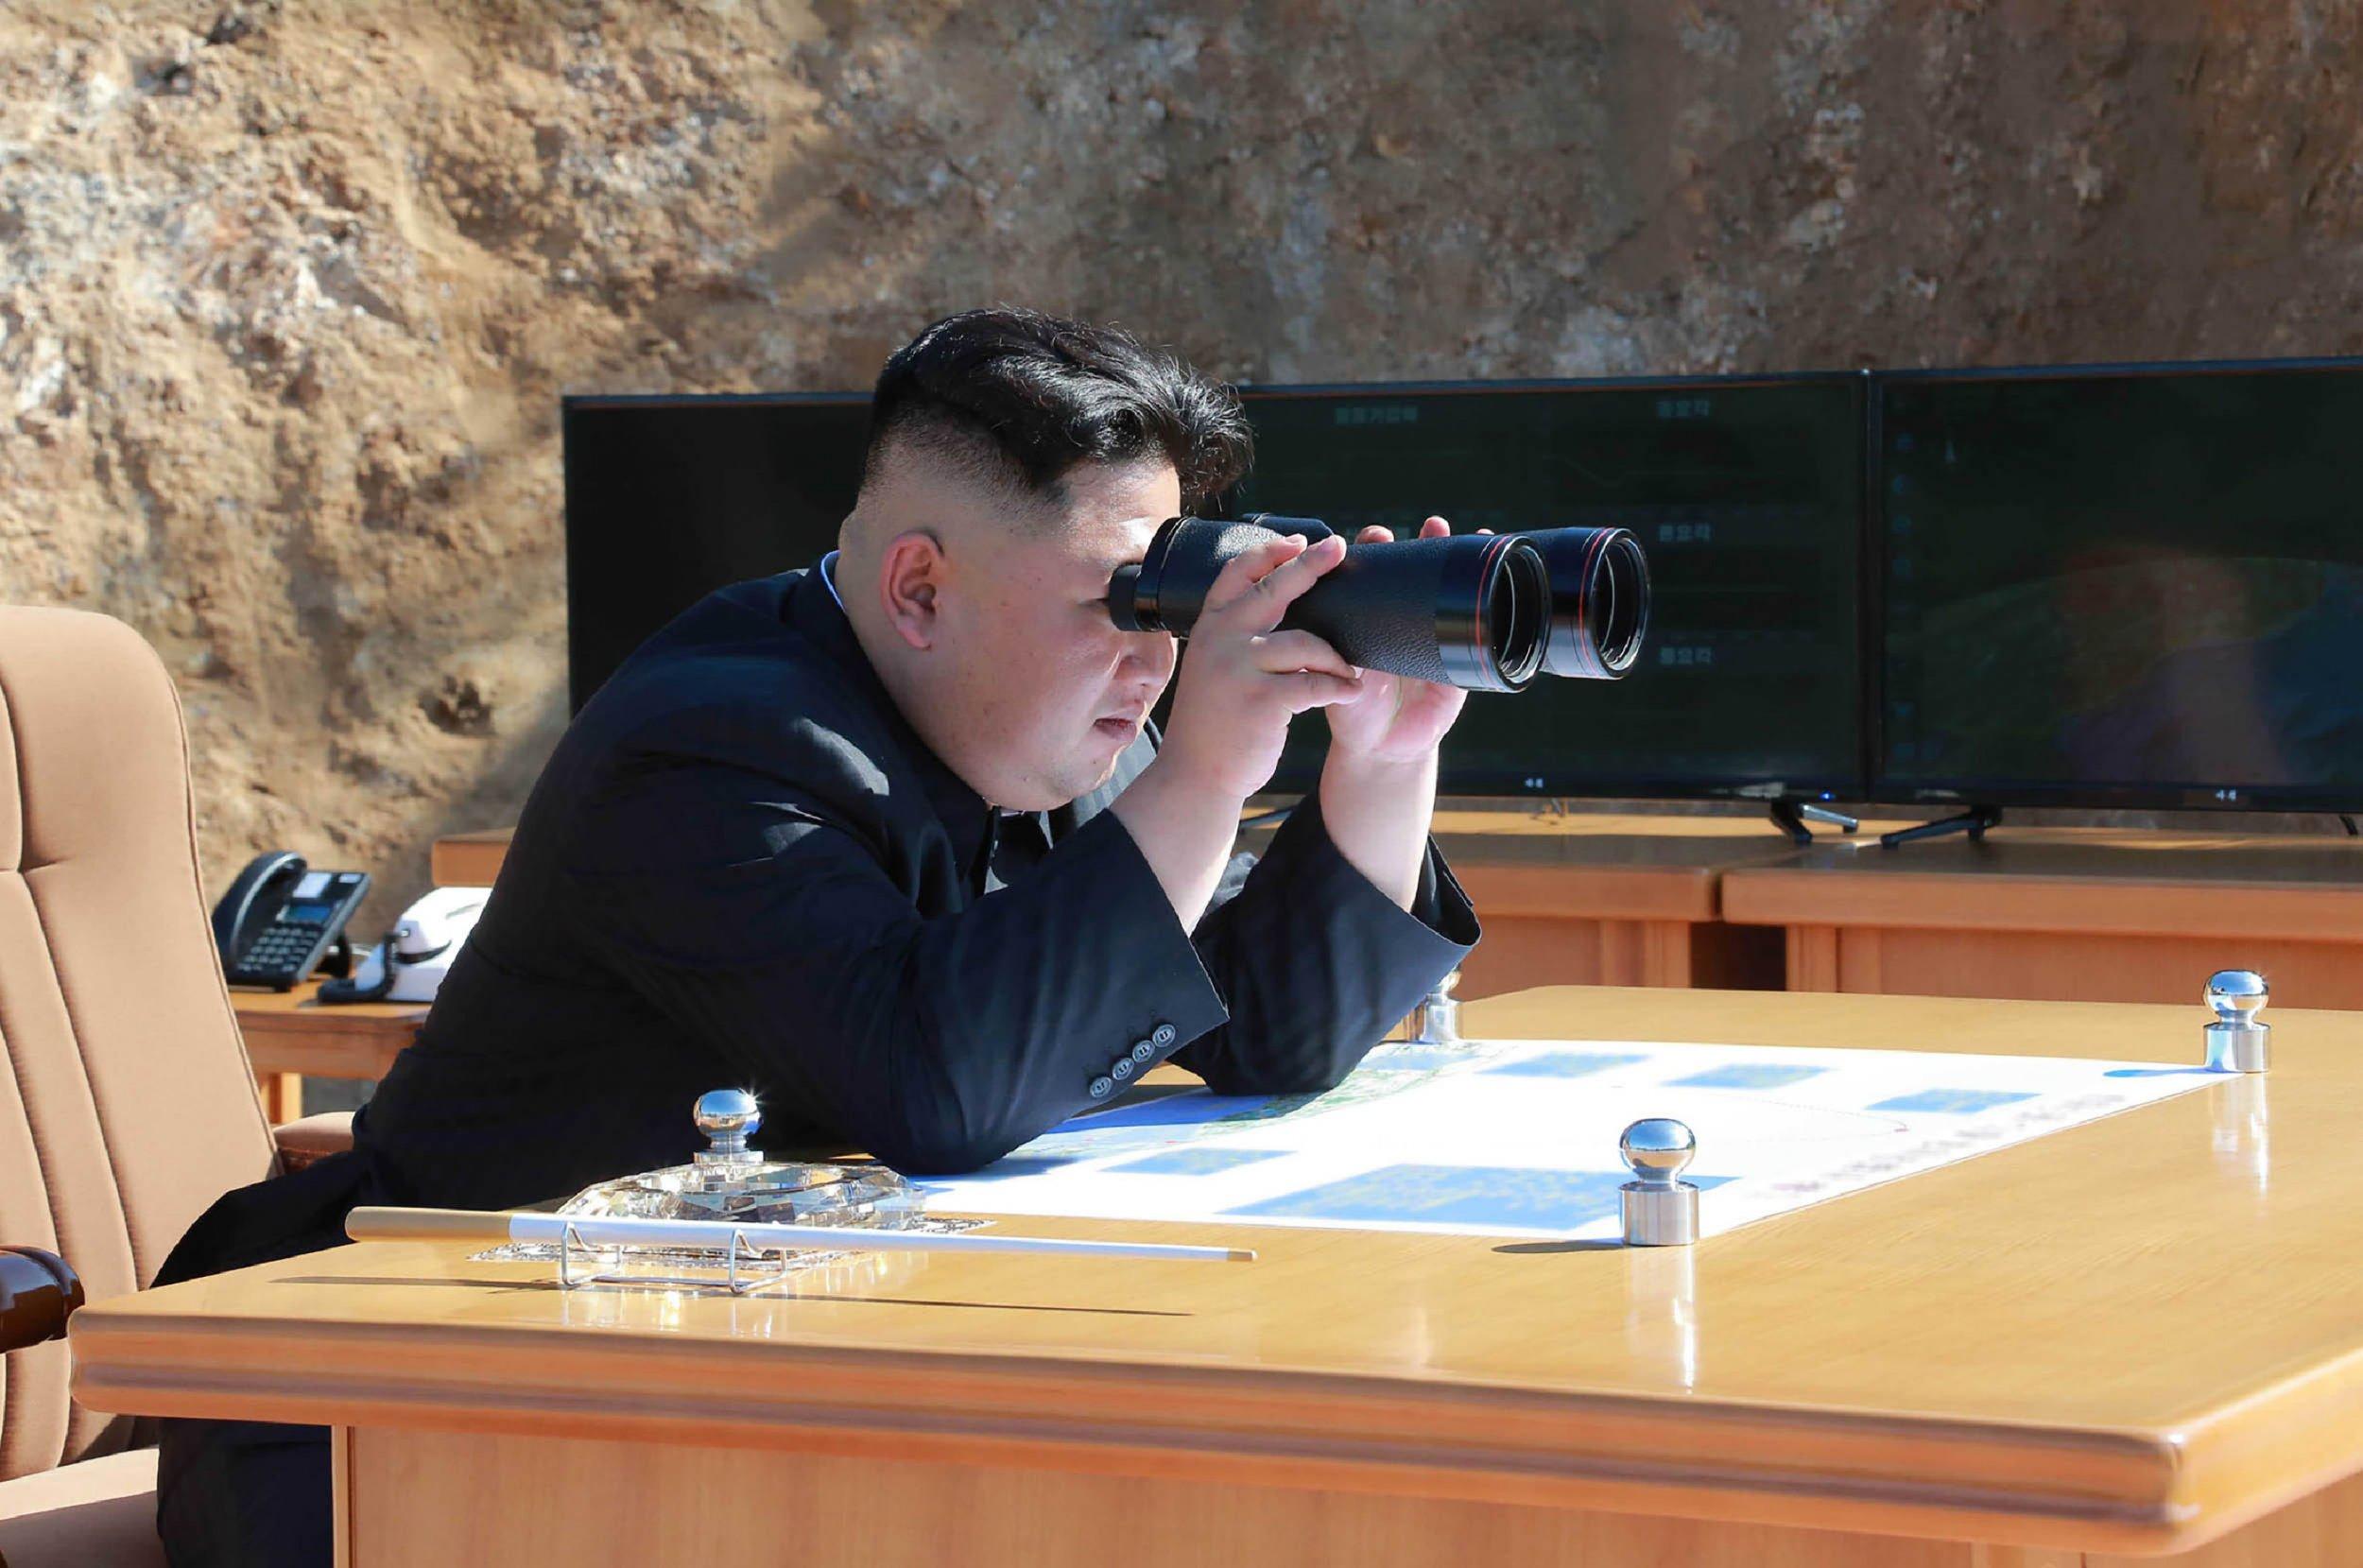 11_29_NorthKorea_01